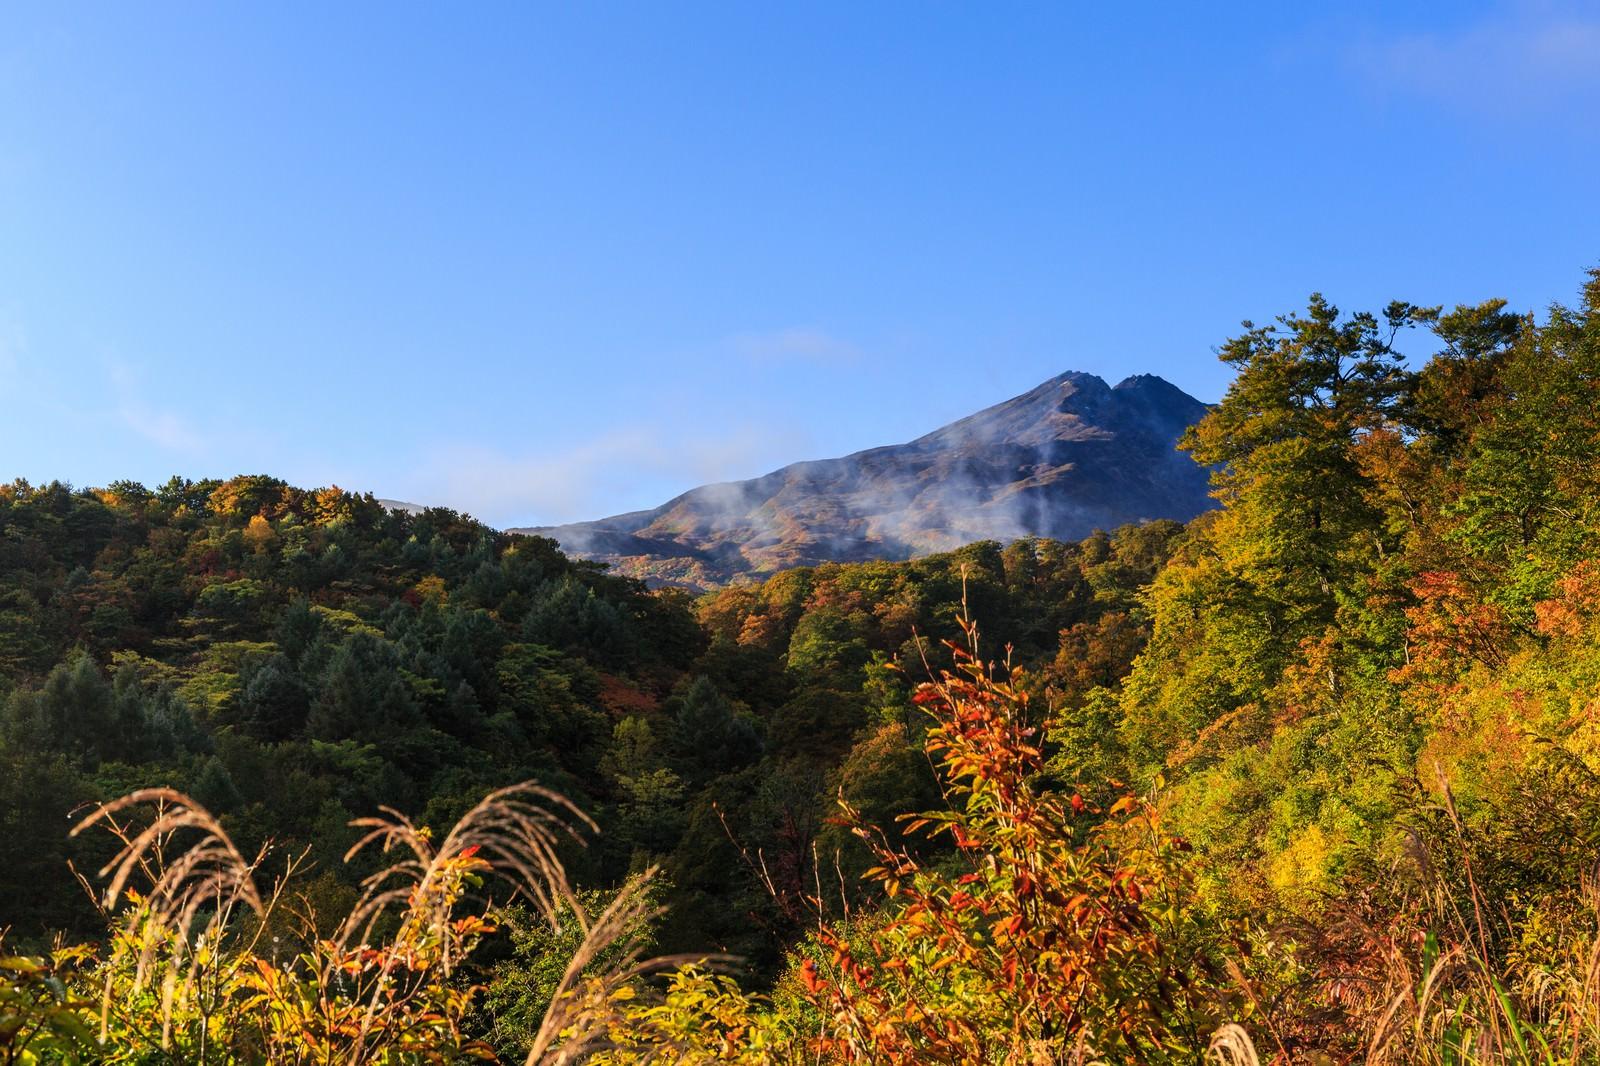 「紅葉時期の鳥海山麓」の写真